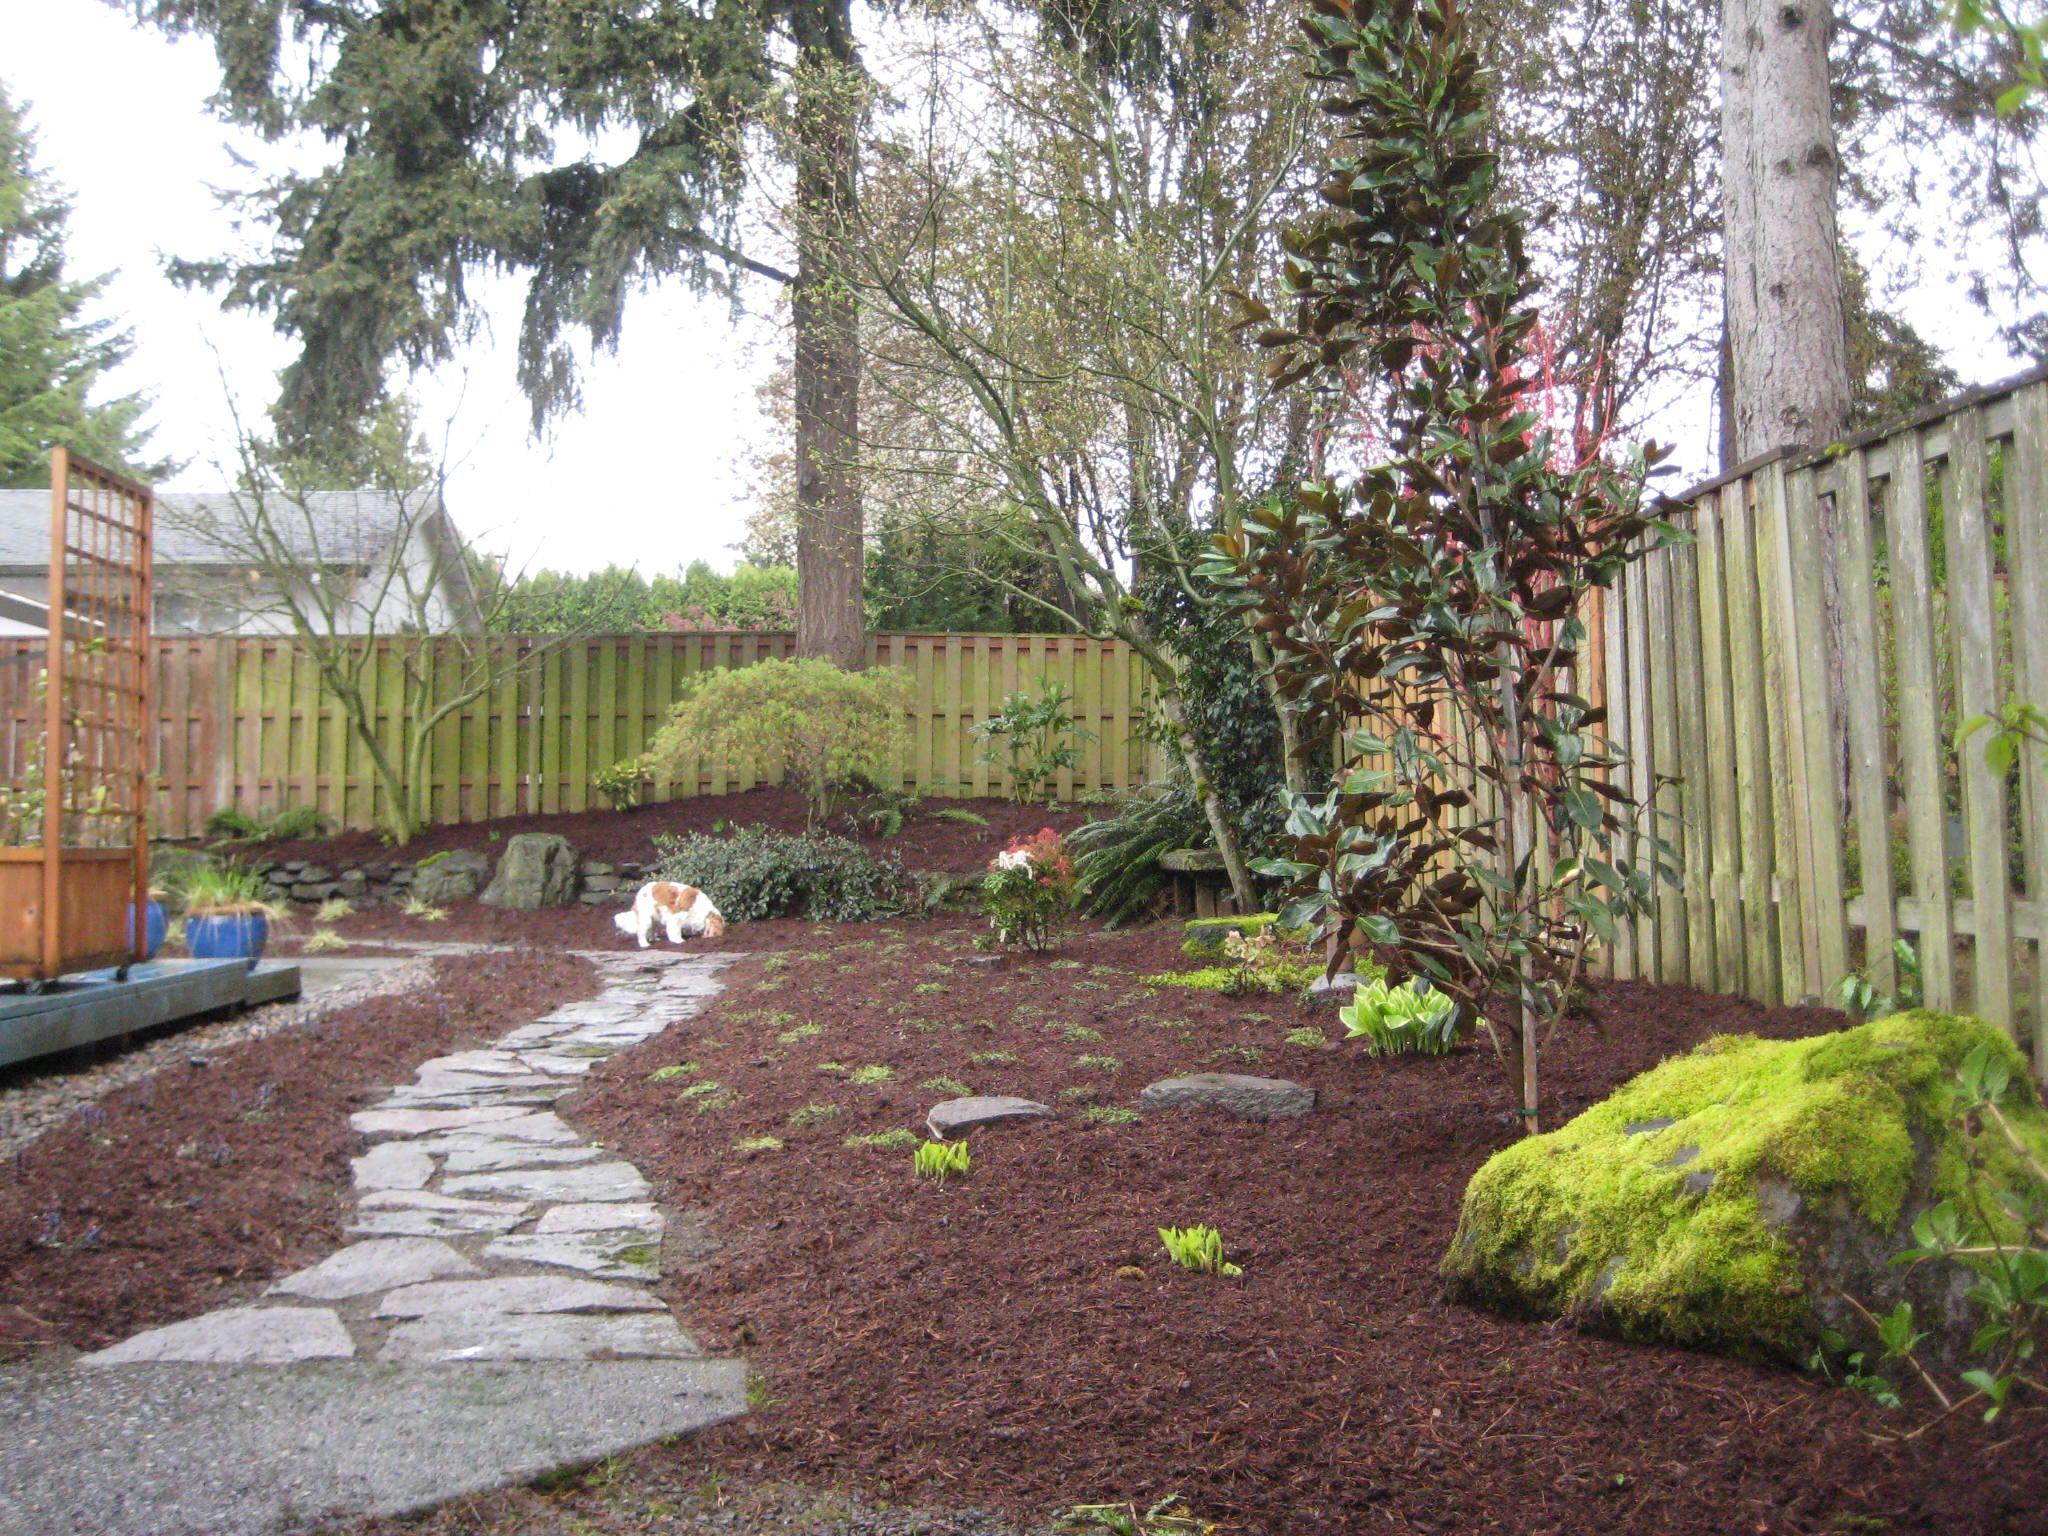 Backyard Ideas Without Grass For Dogs - thorplc.com ... on Cheap Backyard Ideas No Grass  id=47947